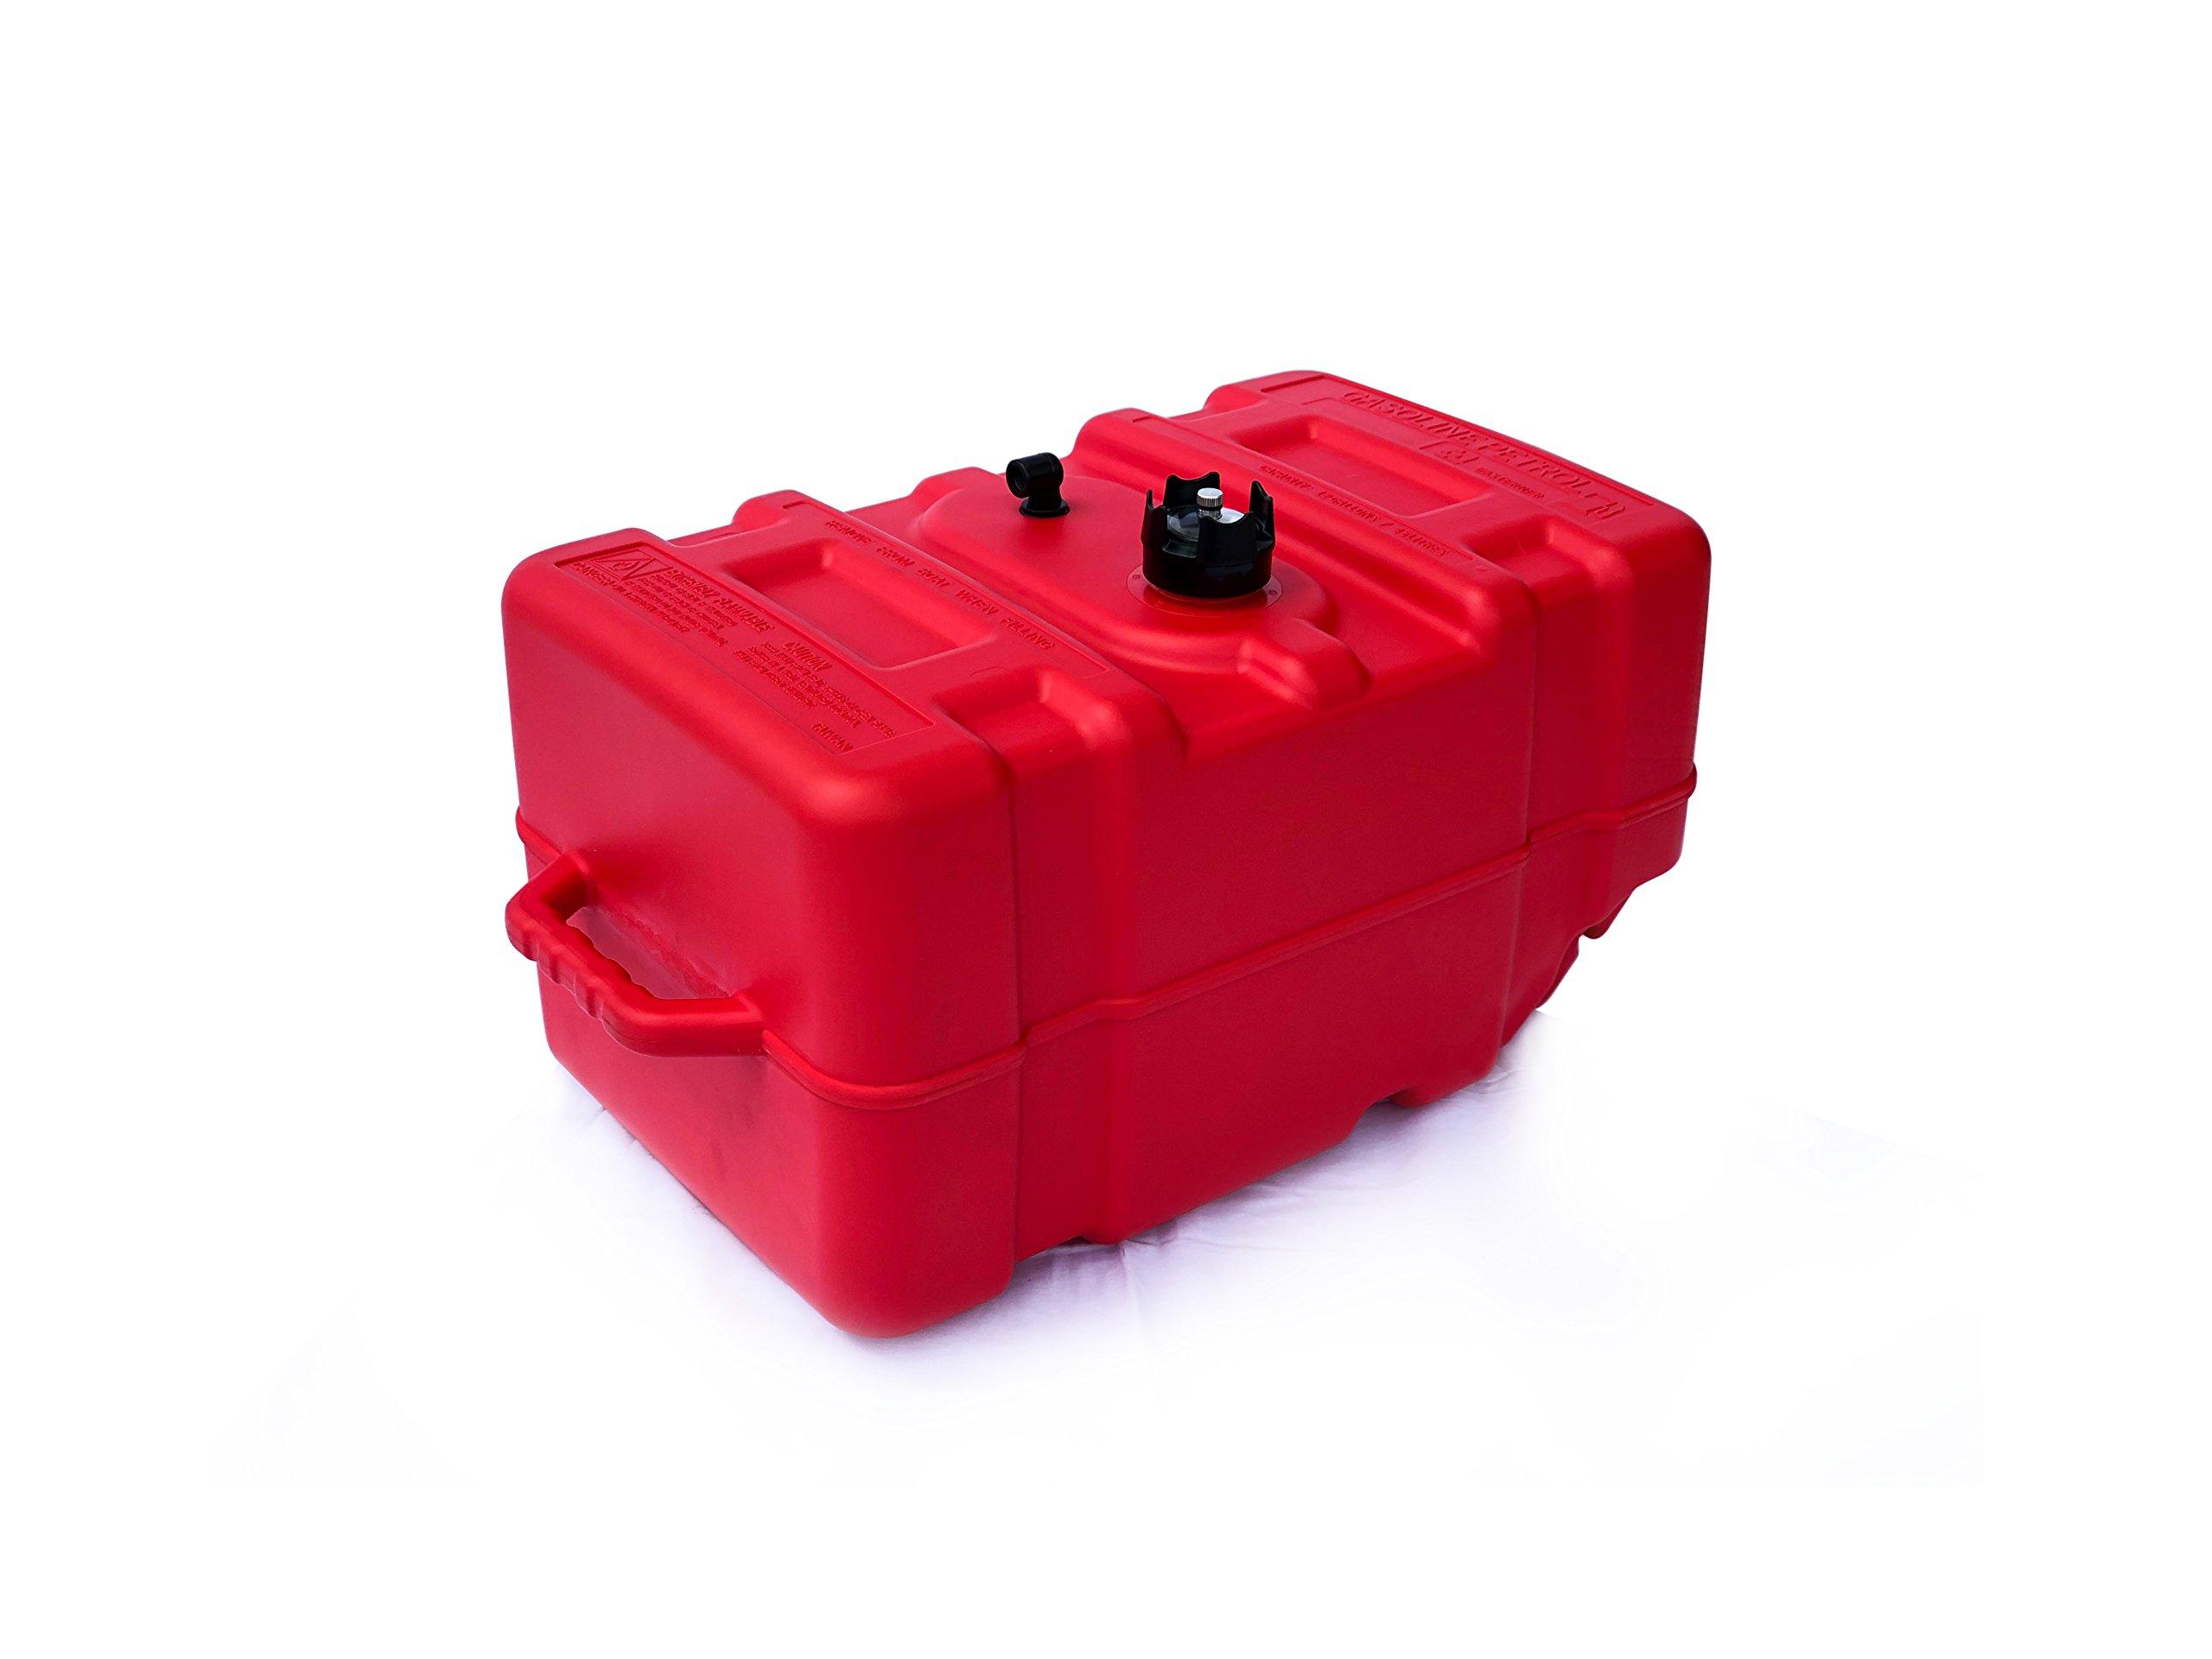 Five Oceans 12 Gallon High Profile Portable Fuel Tank - BC 4269